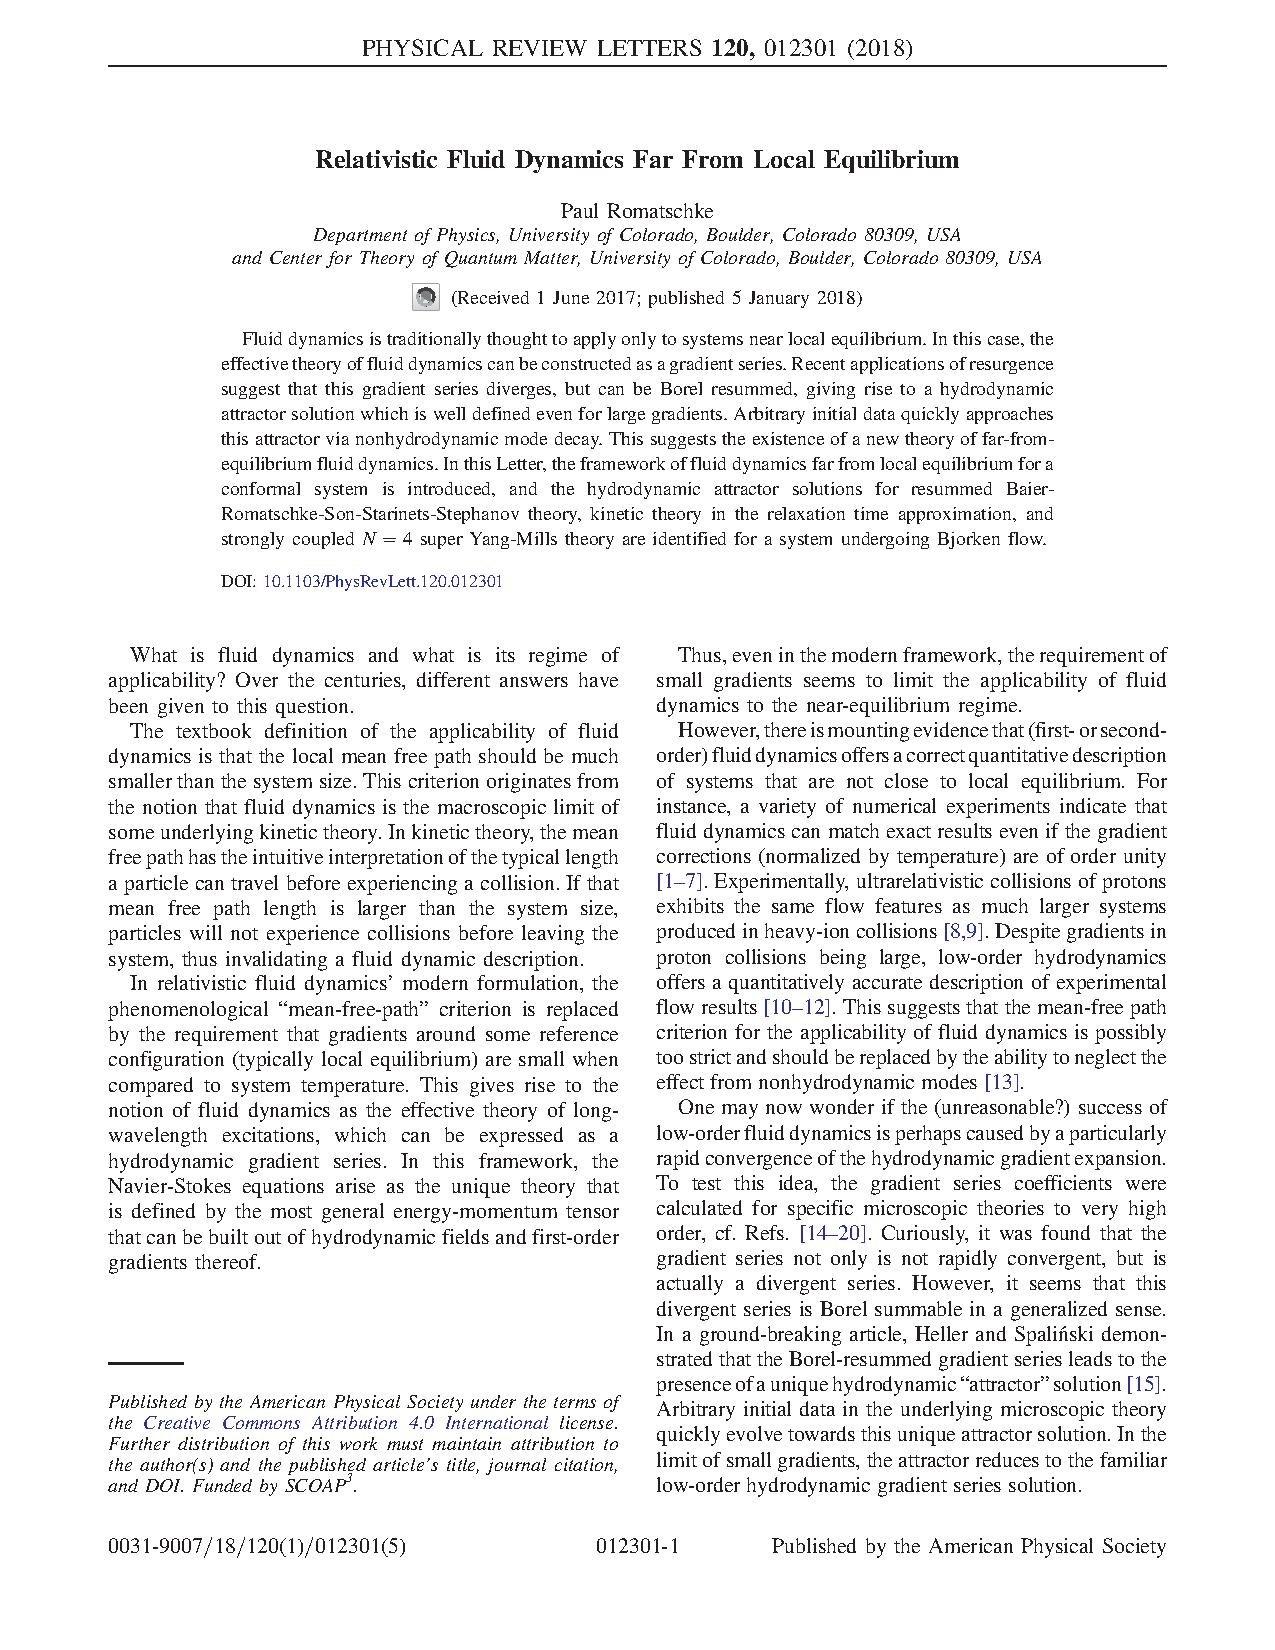 File:PhysRevLett 120 012301 pdf - Wikimedia Commons